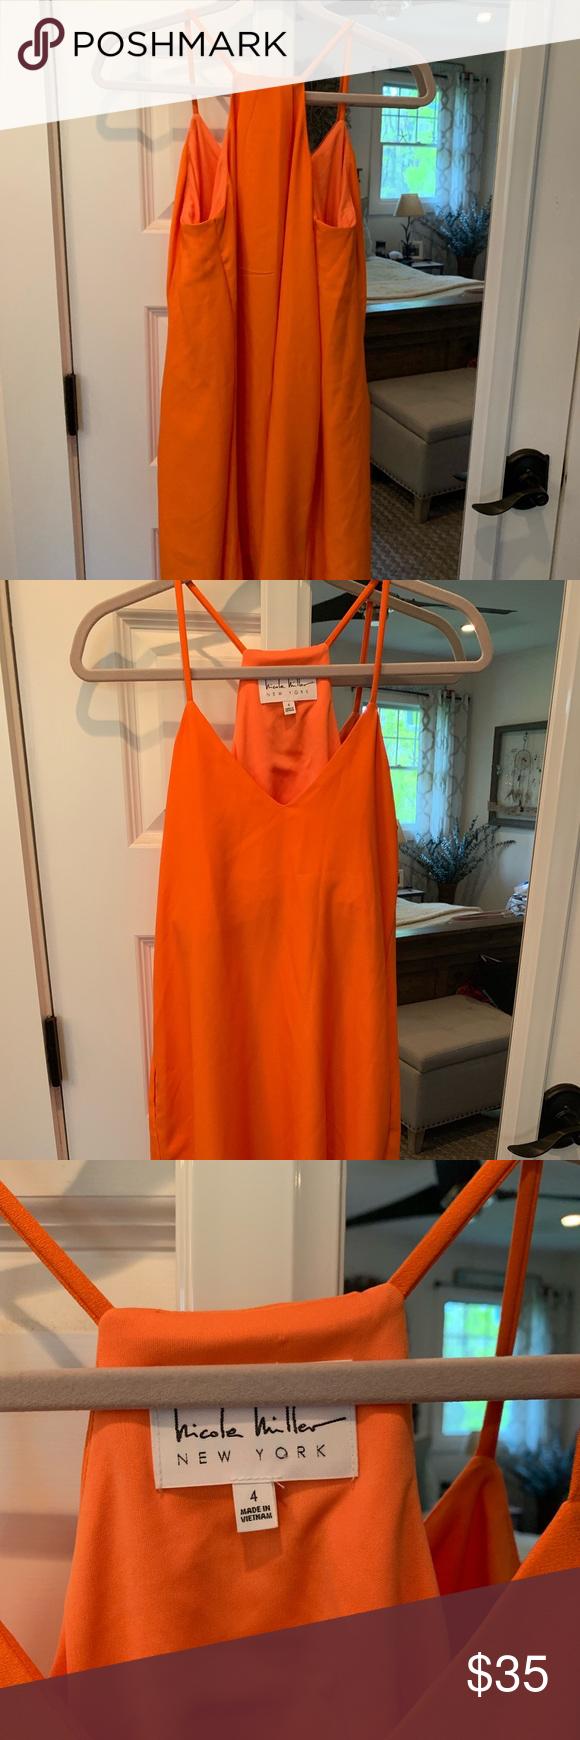 Nicole Miller Dress With Built In Bra Support Nicole Miller Dresses Support Bras Bright Orange Dress [ 1740 x 580 Pixel ]